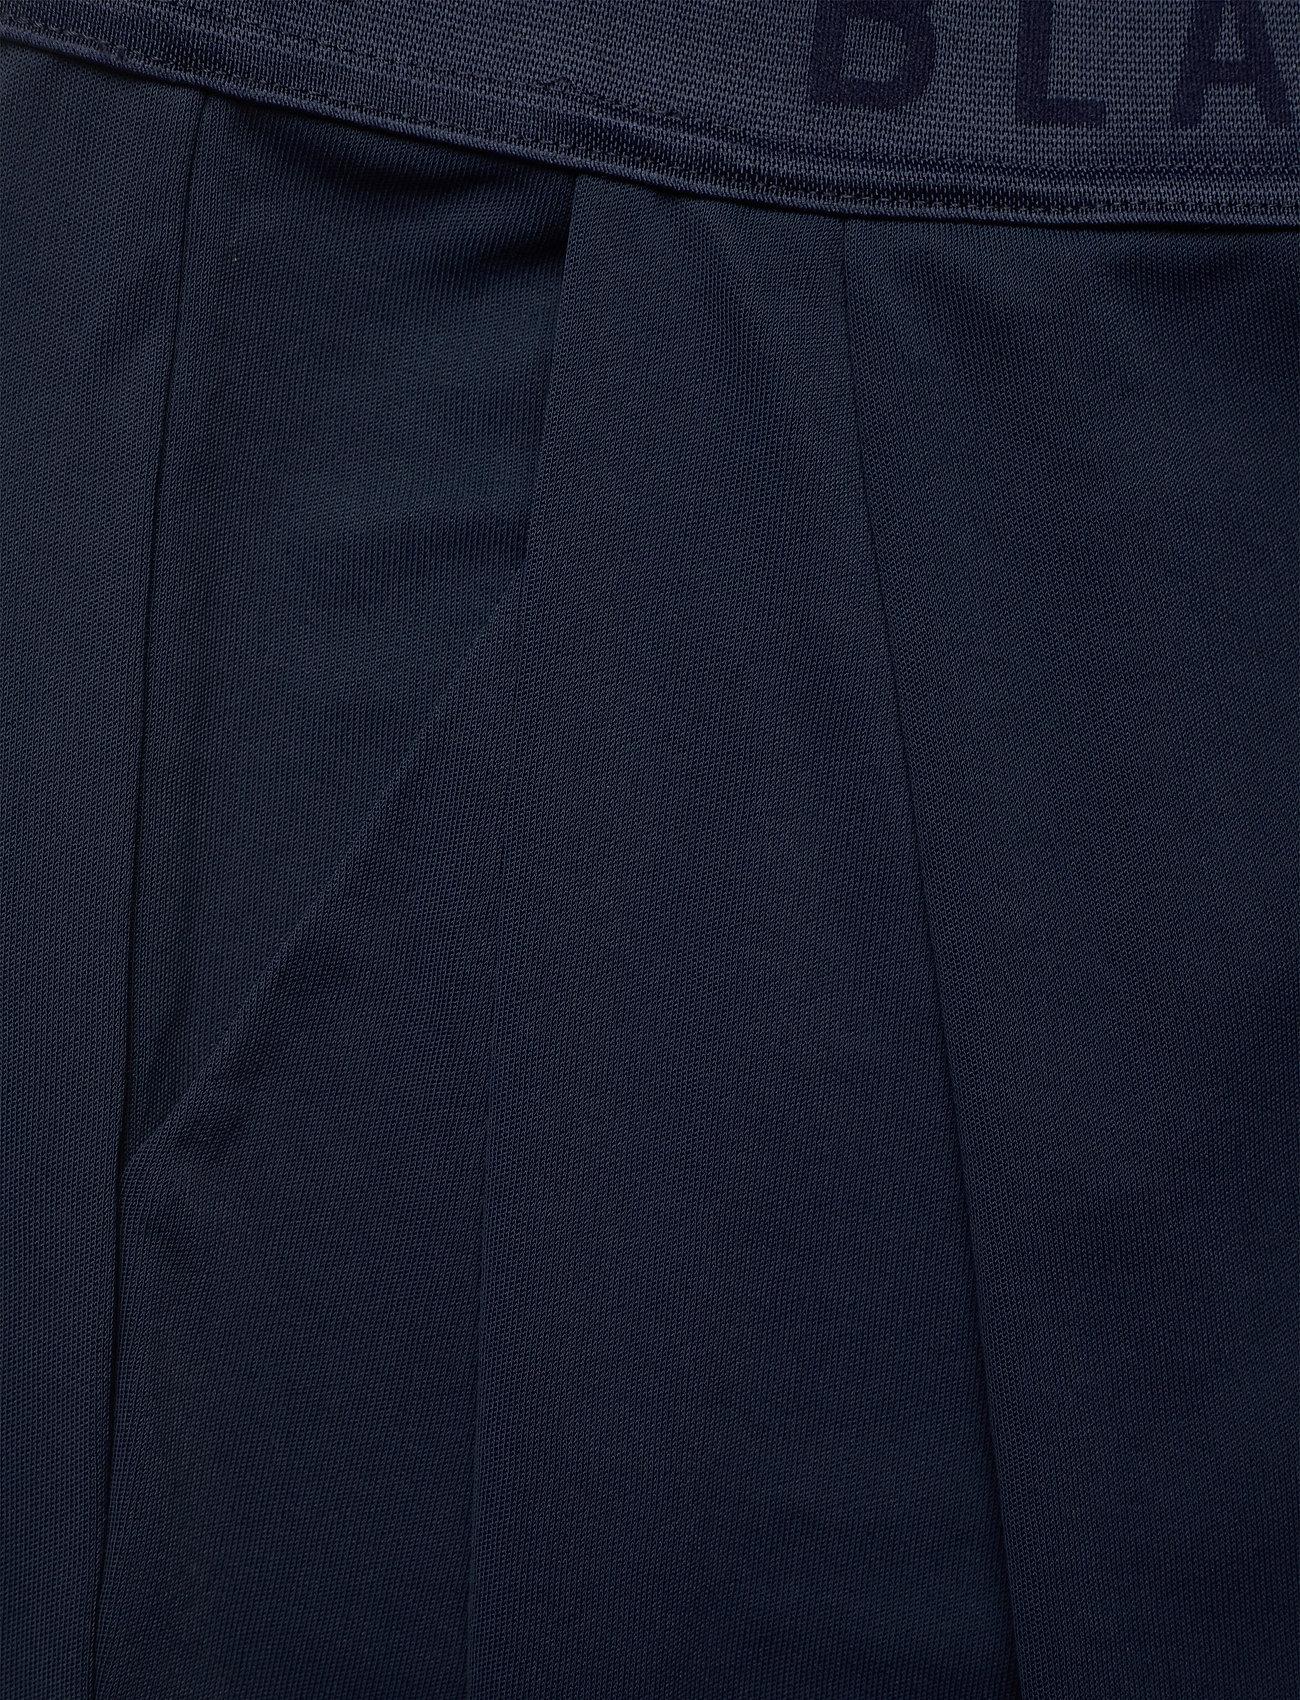 Blanche - Carisi Pants - sale - navy - 2